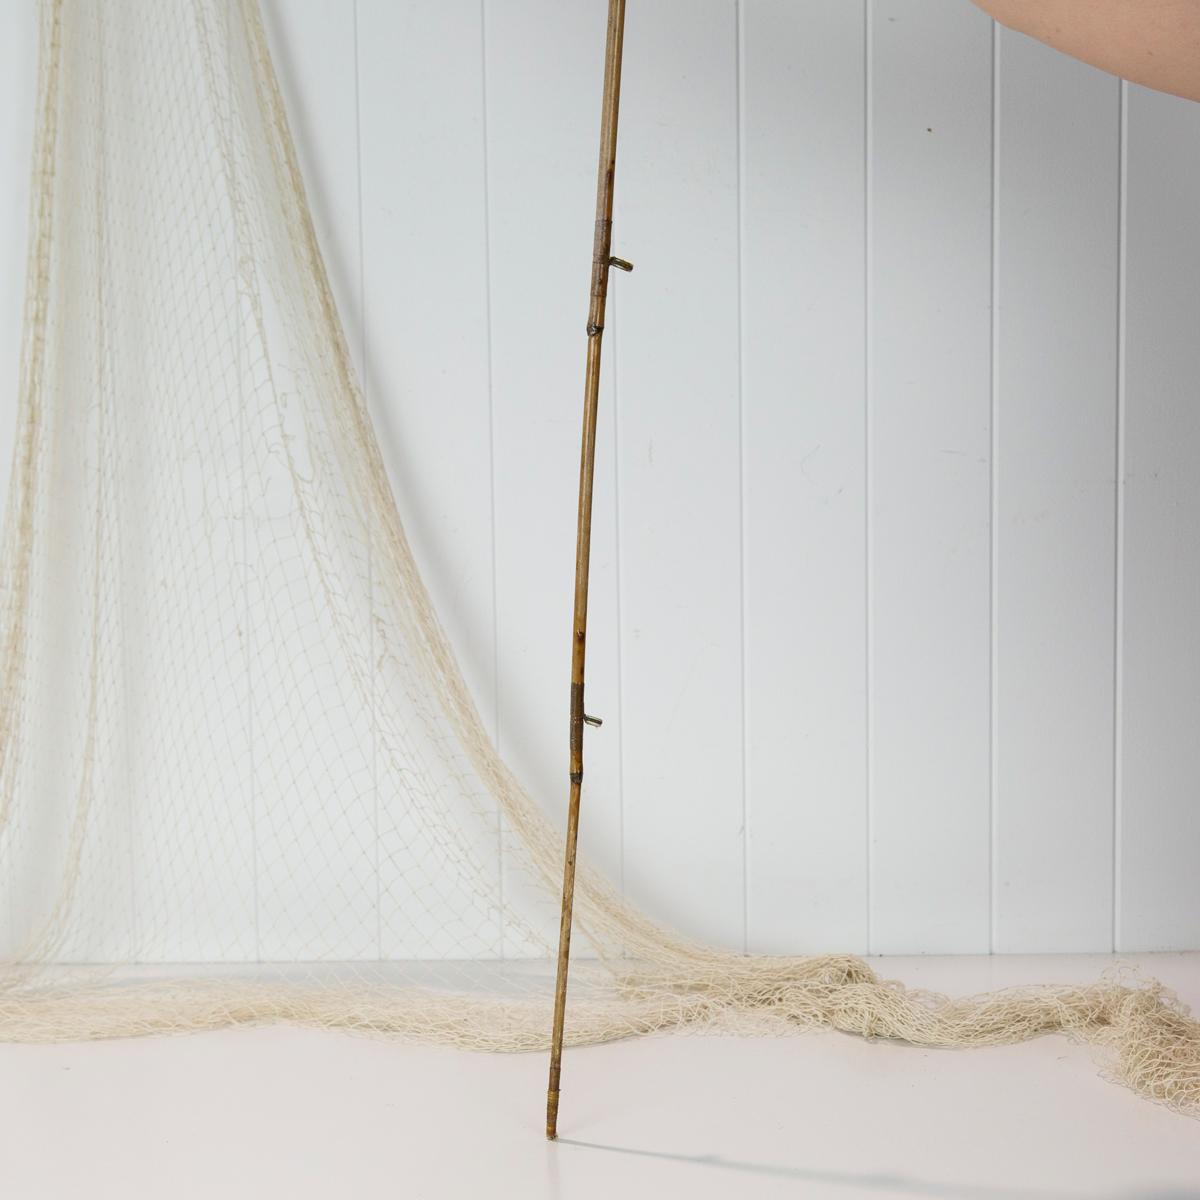 Bamboo Rod #5277